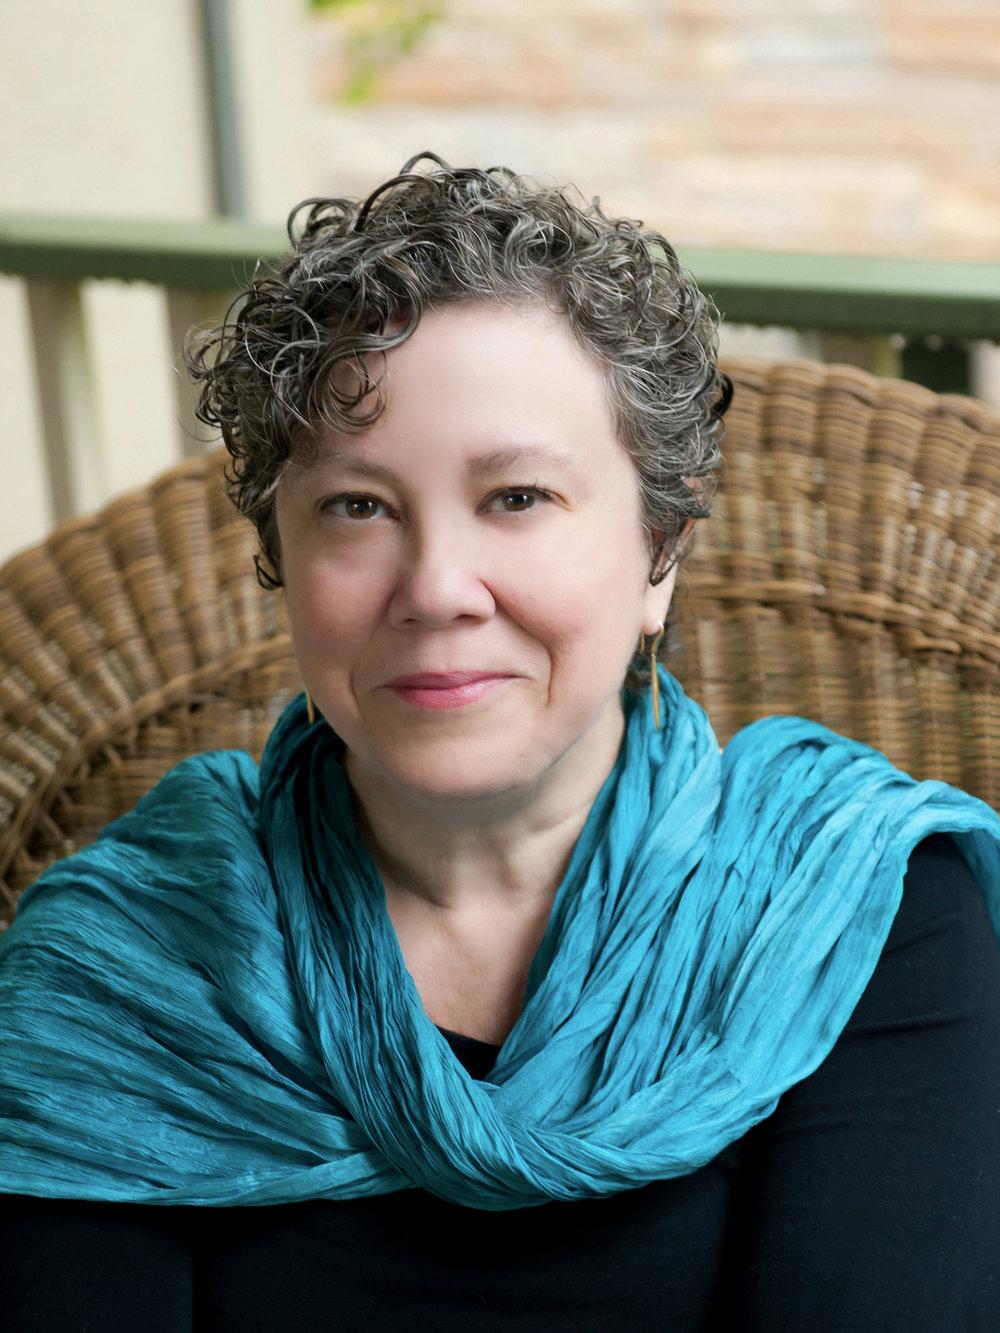 Susan+Katz+Miller+HEadshot.jpg